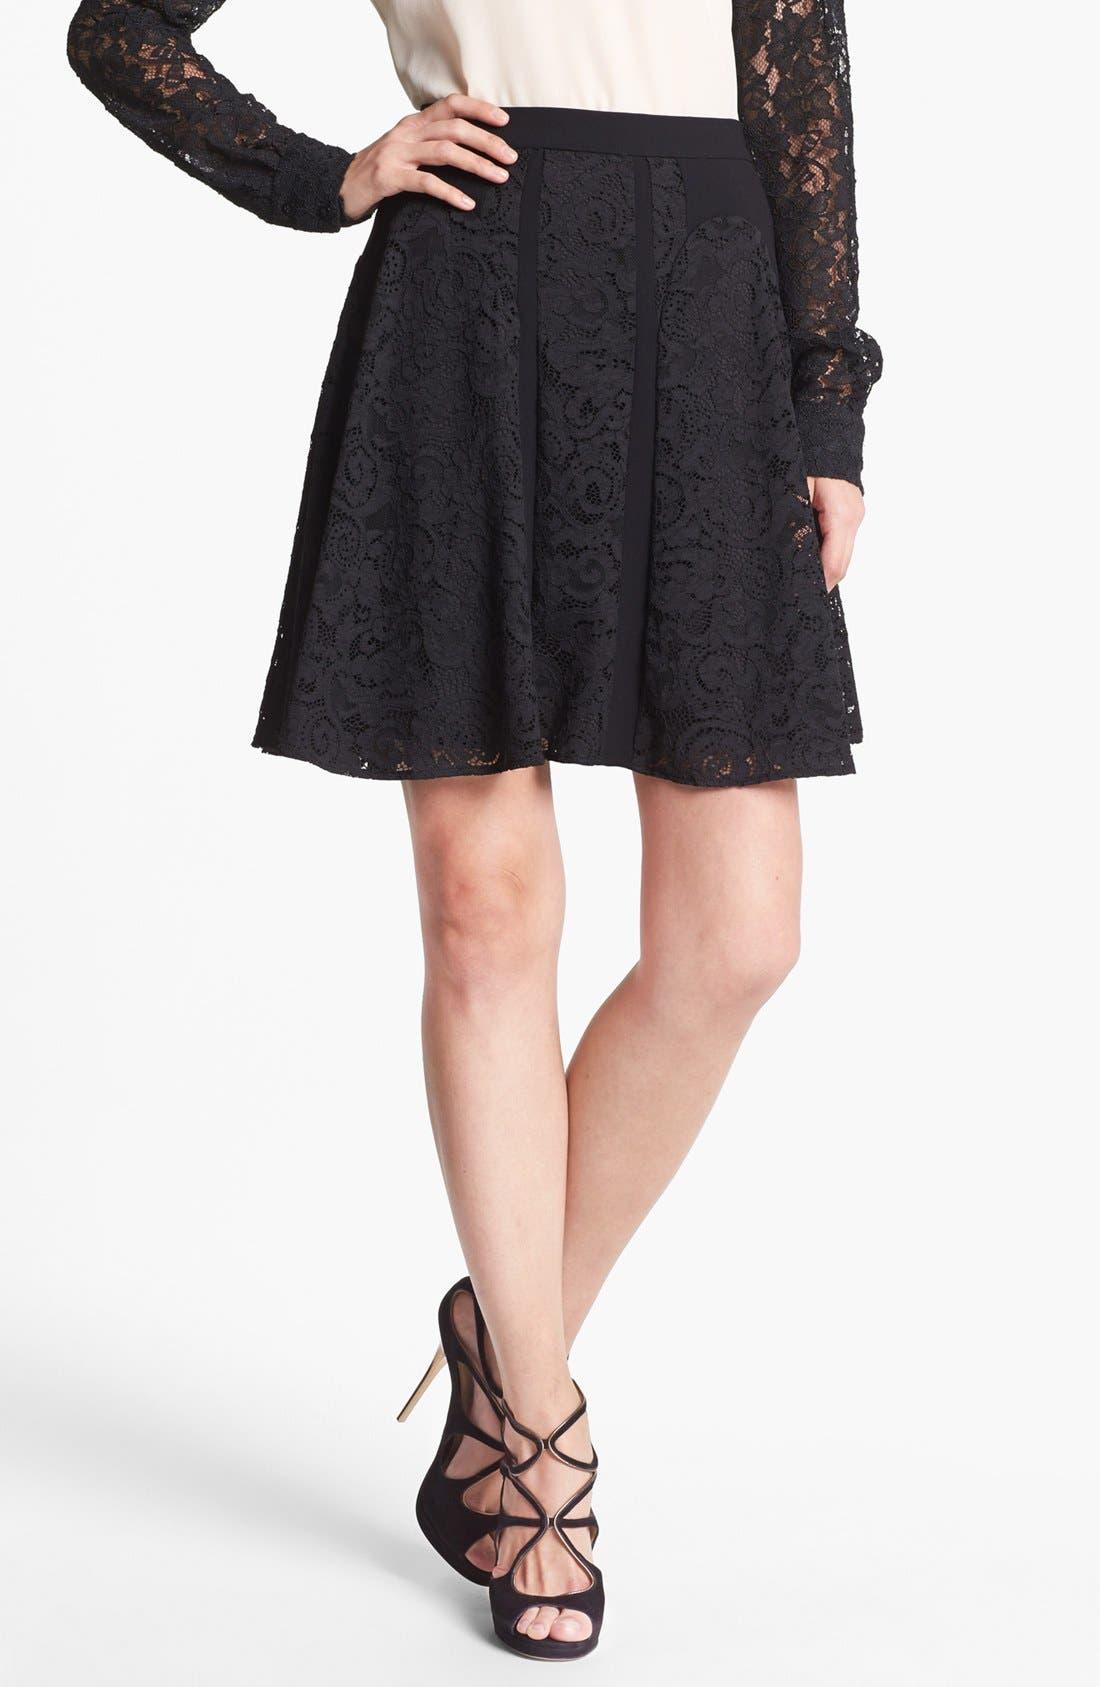 Main Image - Diane von Furstenberg 'Radella' Paneled Lace Skirt